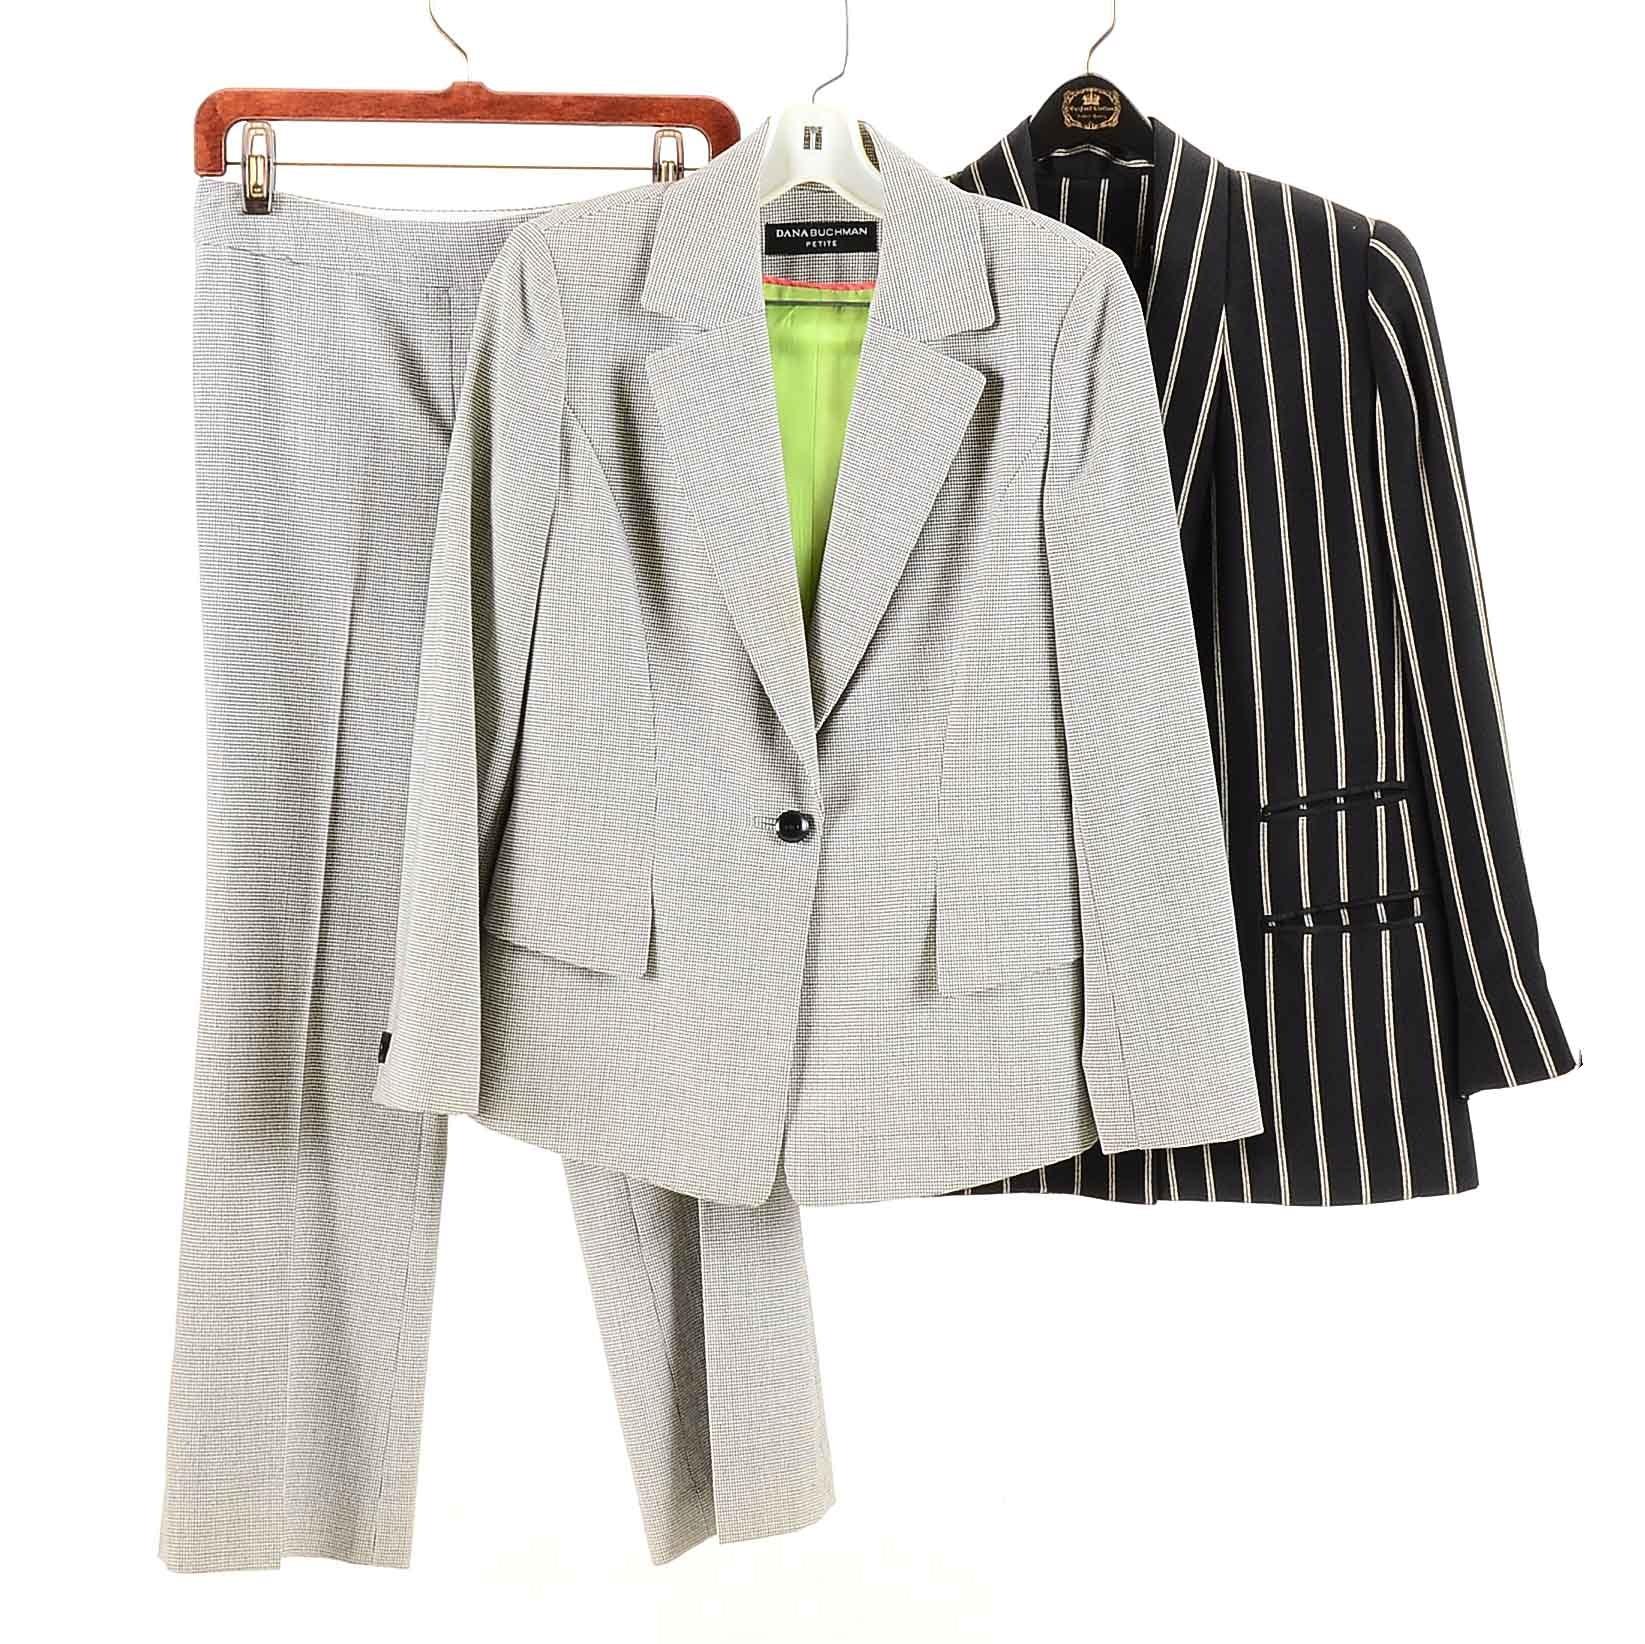 Women's Dana Buchman Petite Pant Suit and Blazer